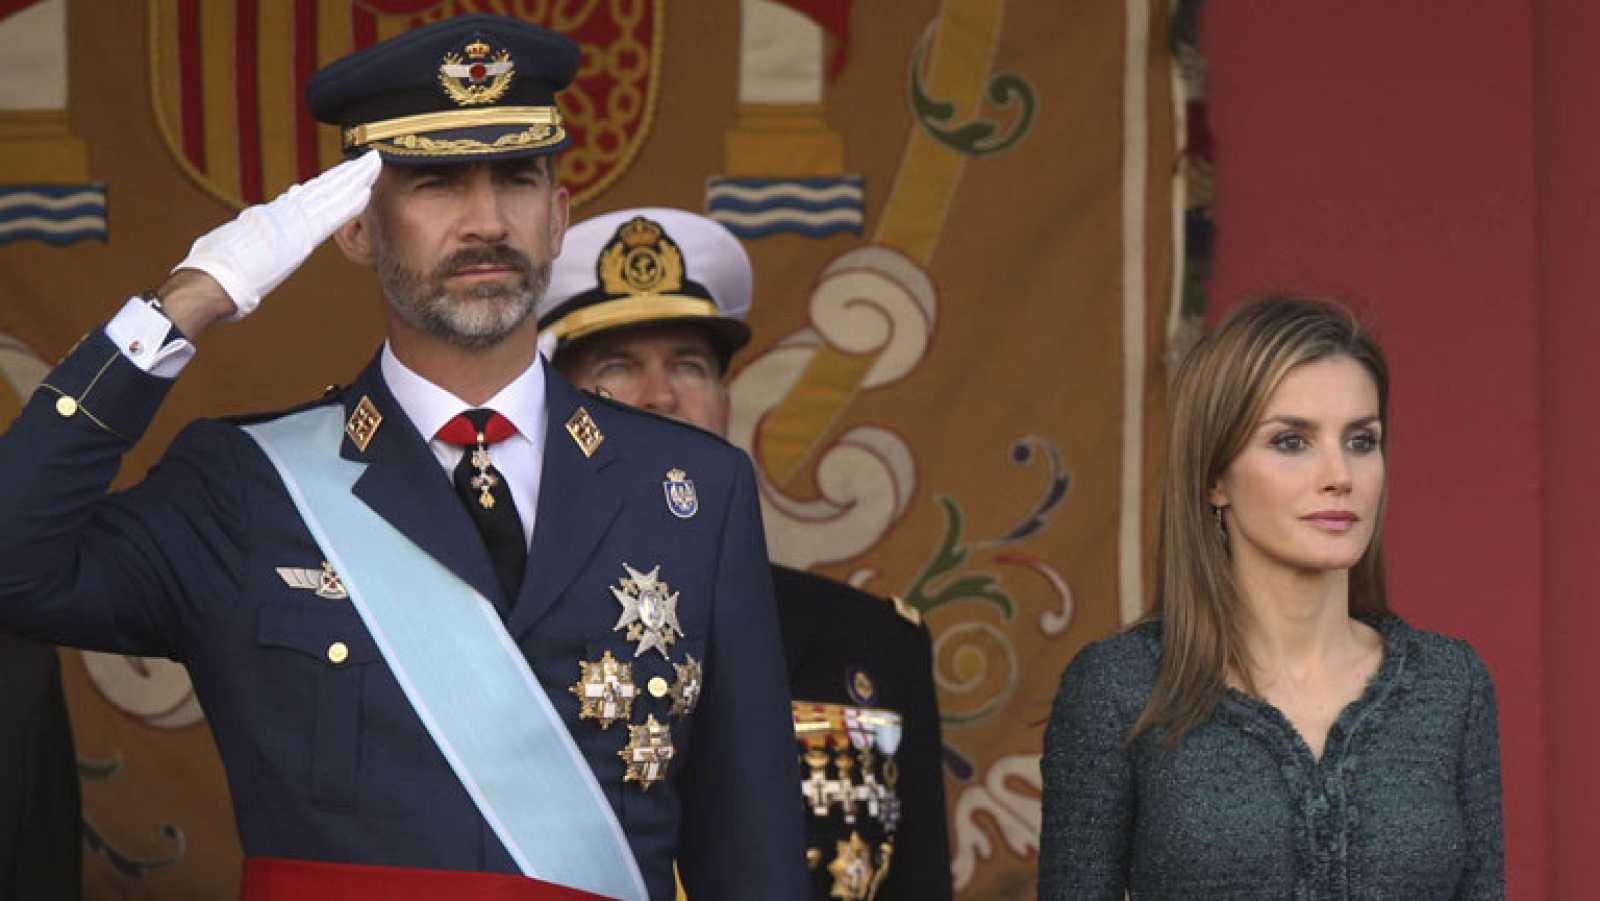 Felipe VI preside su primer desfile de la Fiesta Nacional como rey